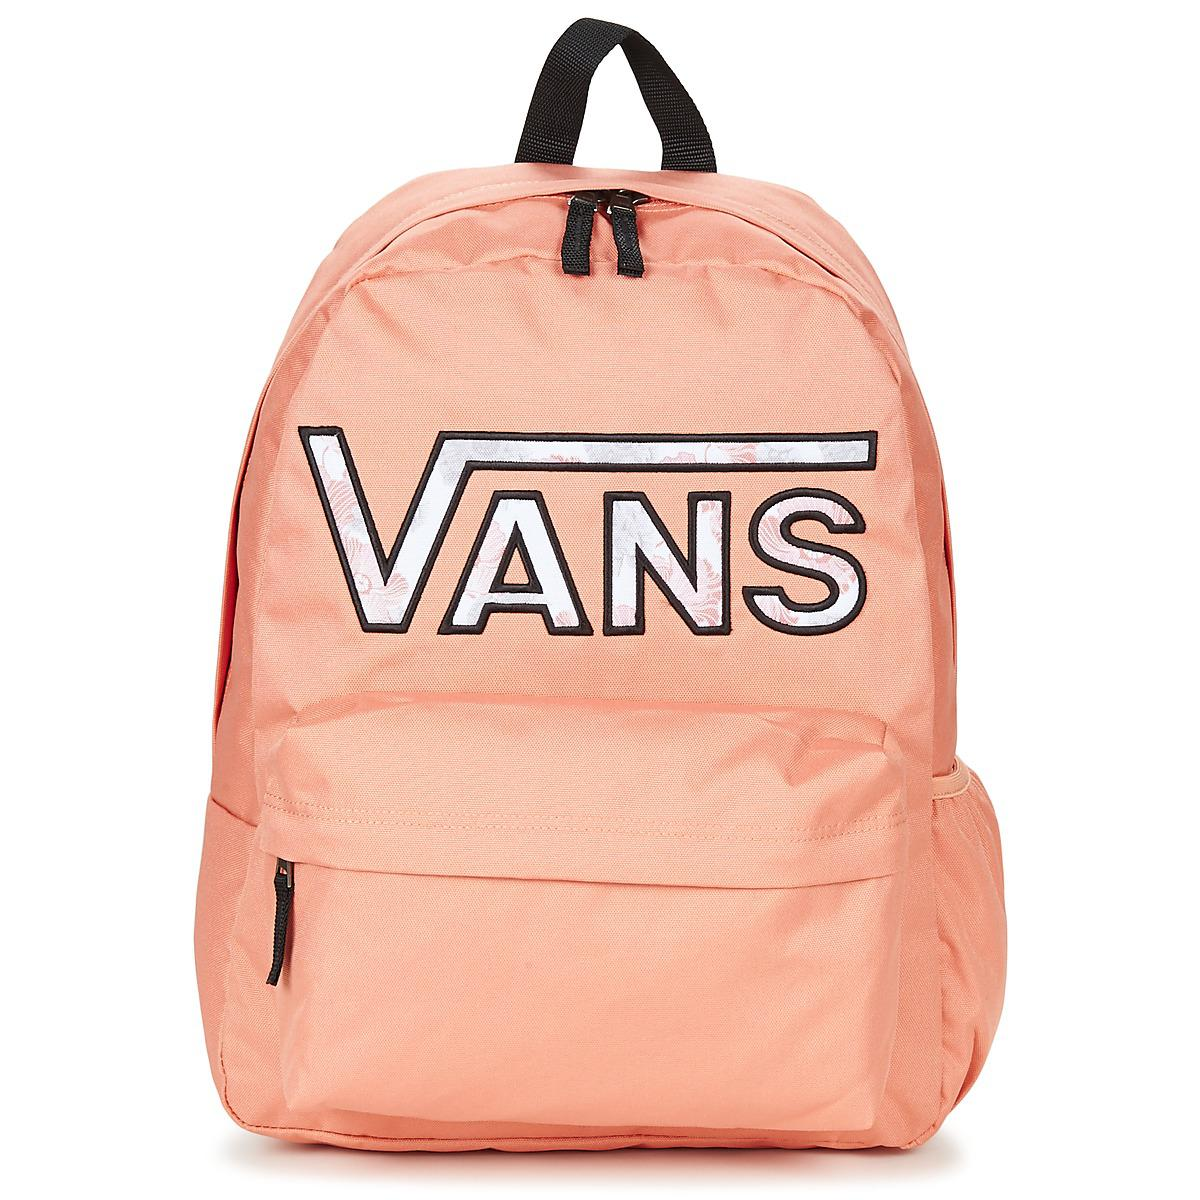 89fa2ea62a Vans Realm Flying V Backpack Women s Backpack In Pink in Pink - Lyst